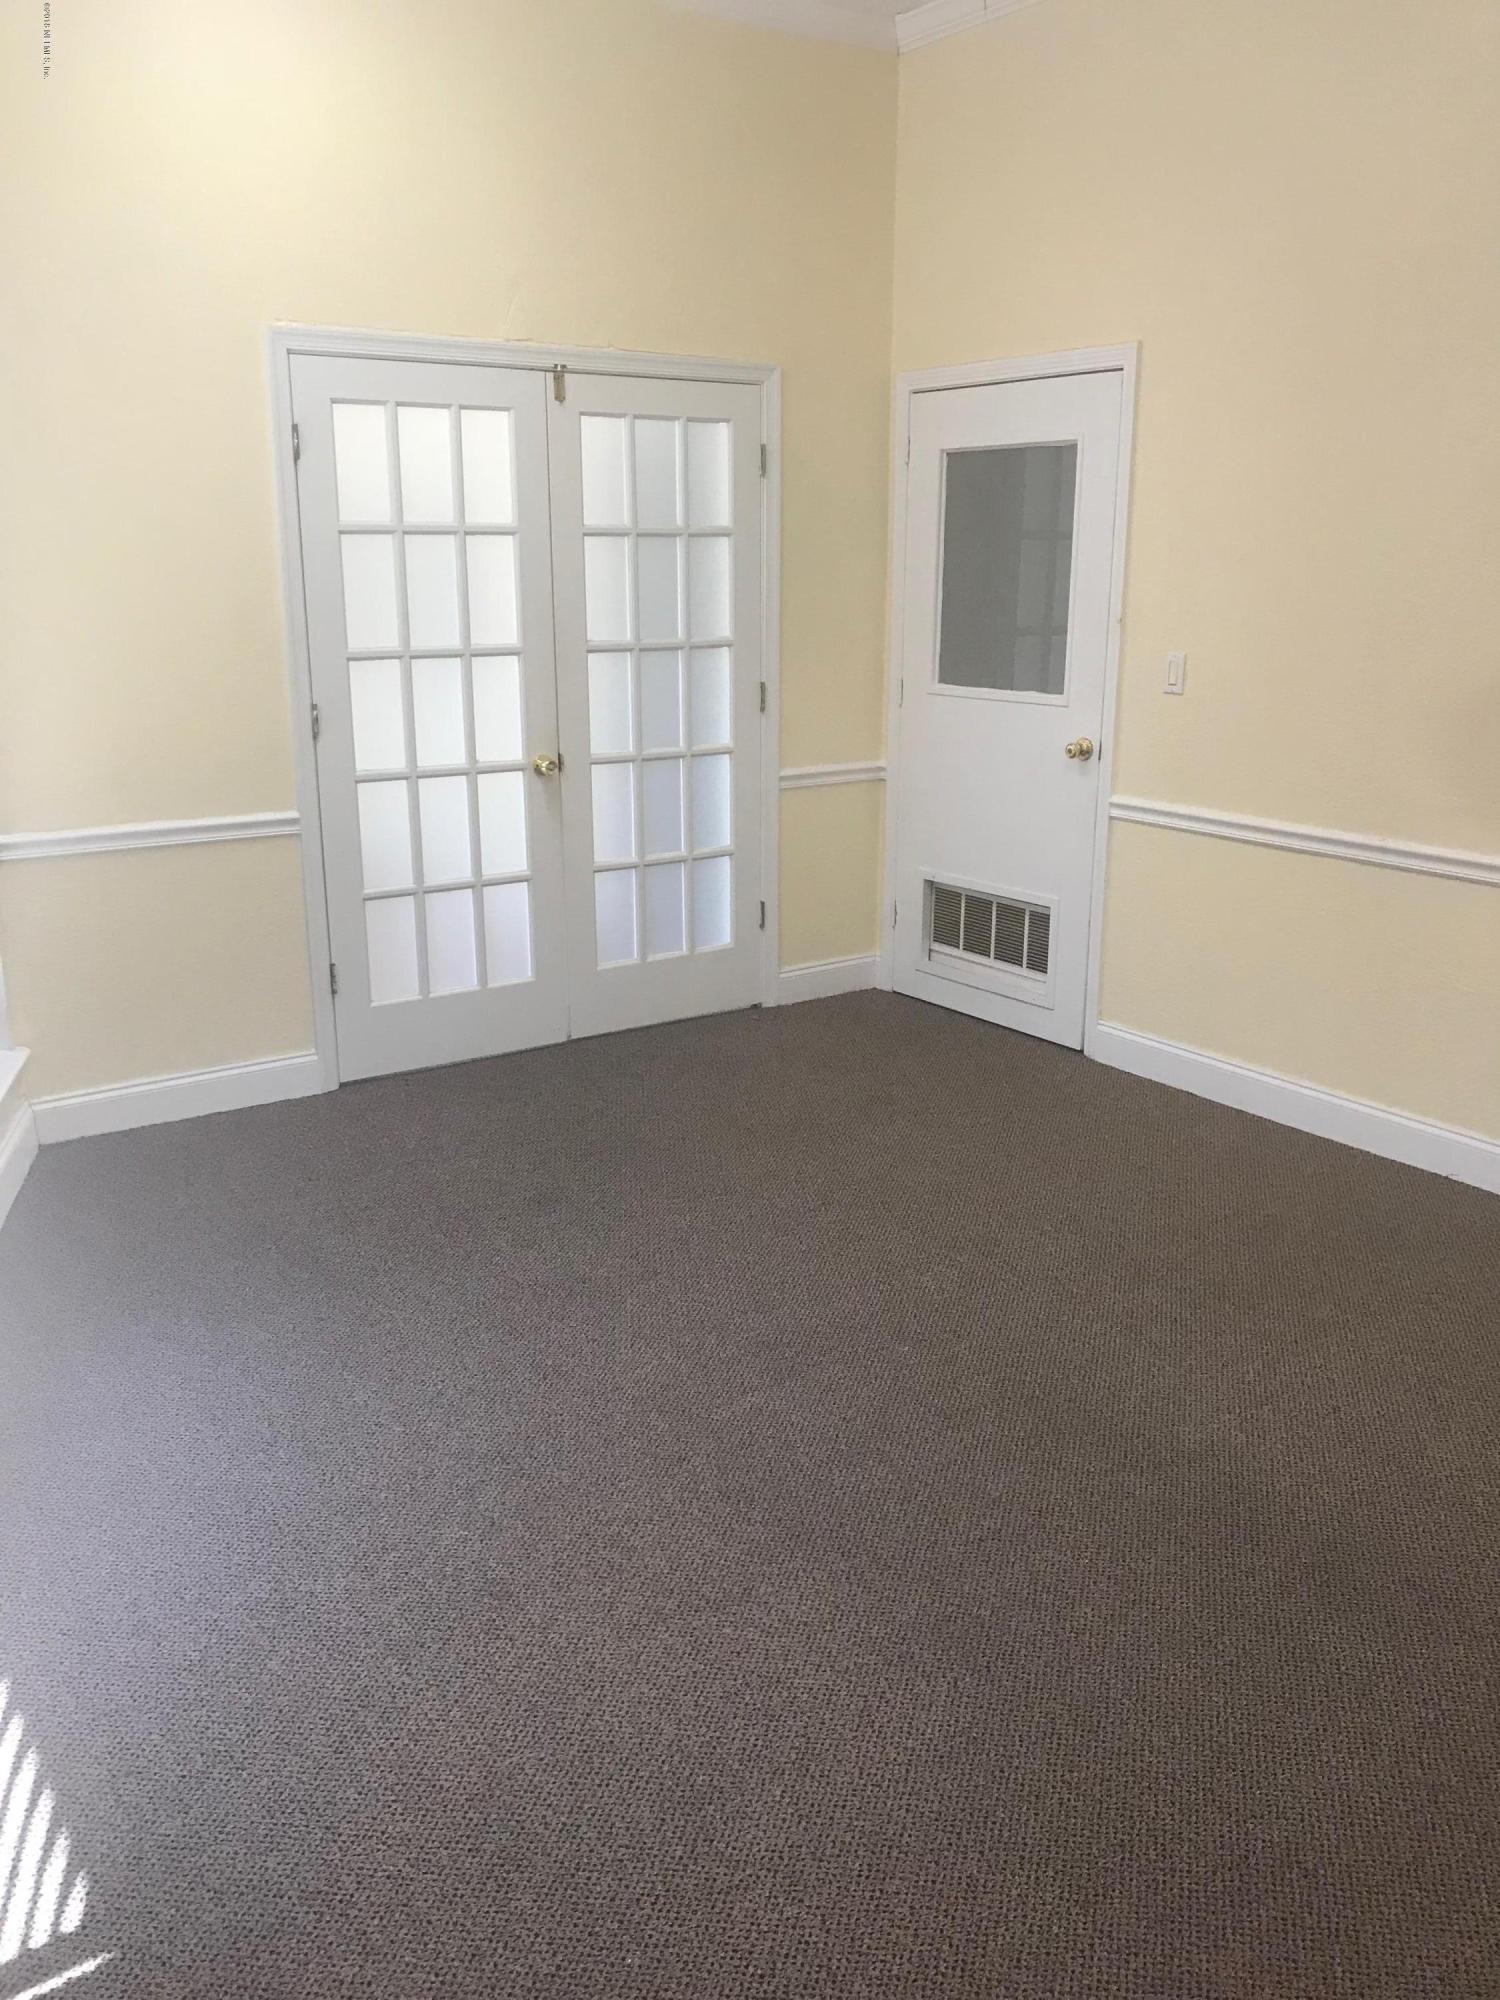 311 ASHLEY, JACKSONVILLE, FLORIDA 32202, ,Commercial,For sale,ASHLEY,970649